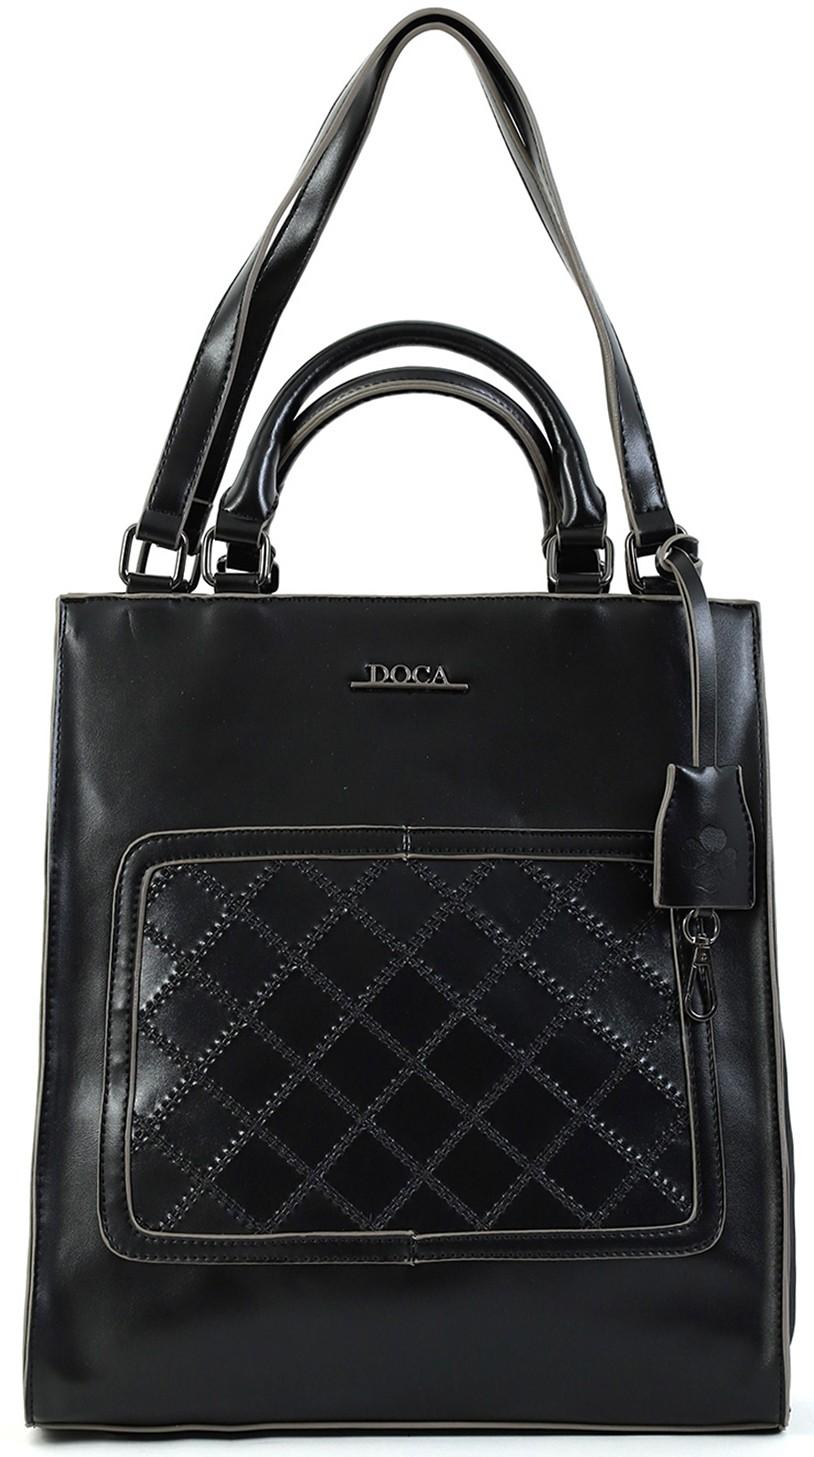 Dámska kabelka Doca 15249 - čierna.